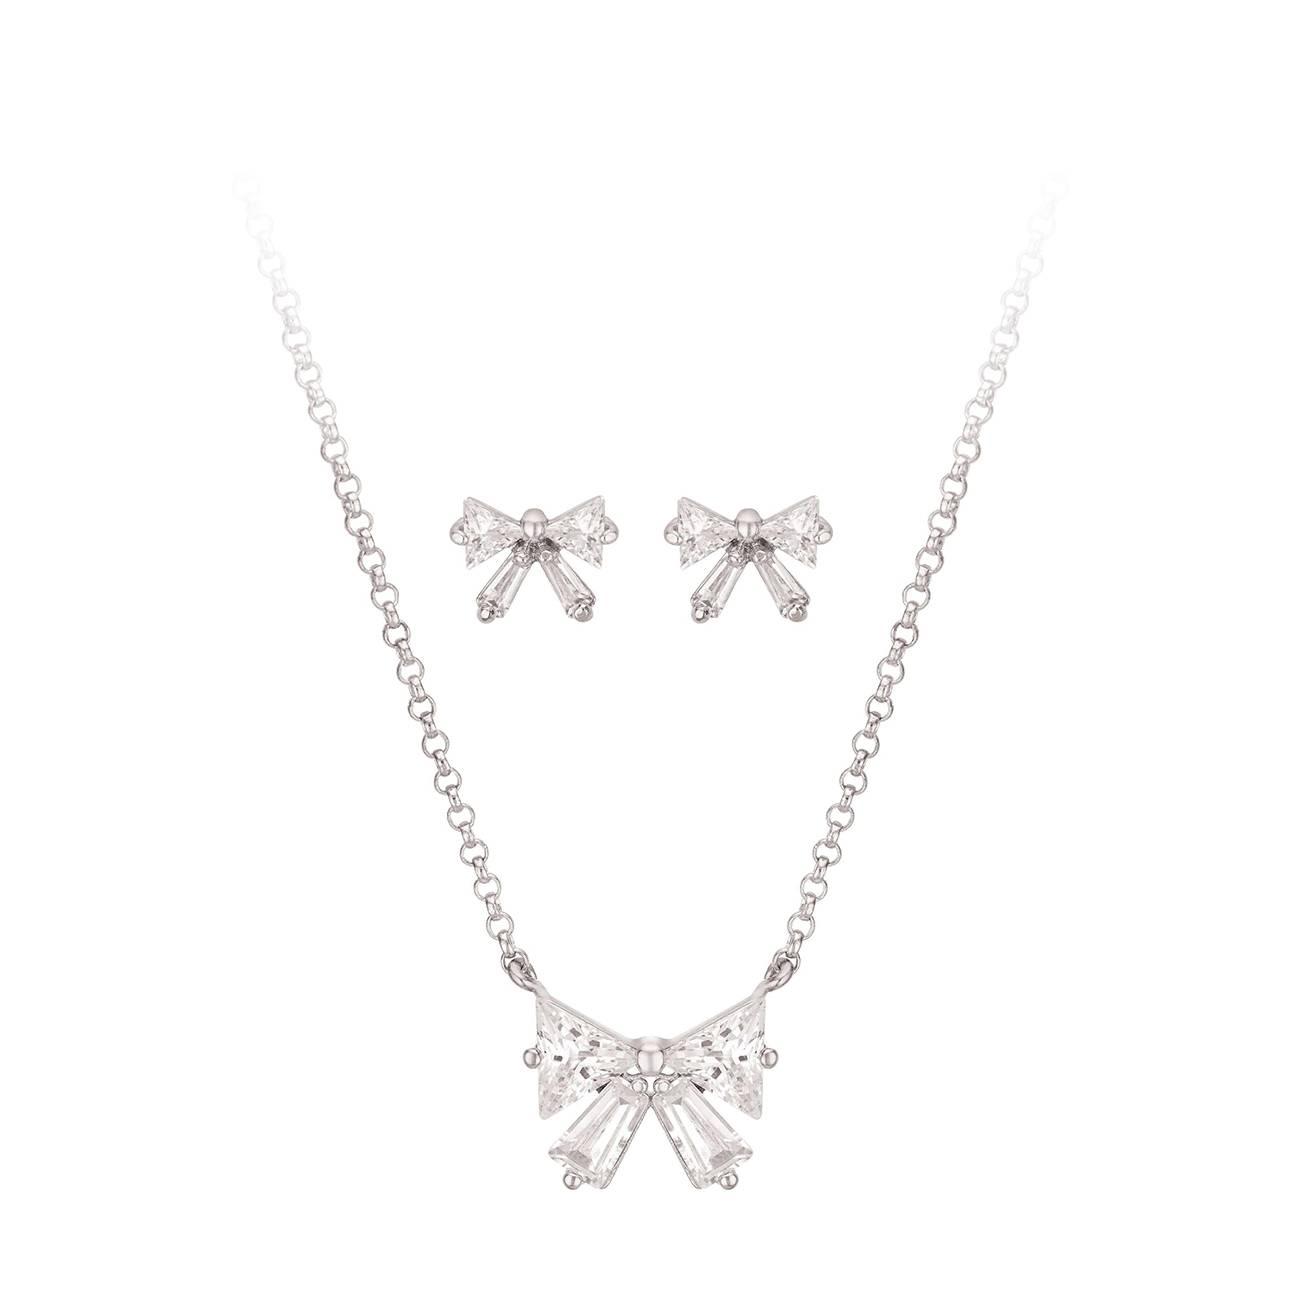 Bow Pendant & Earring Gift Set CZS747 imagine produs